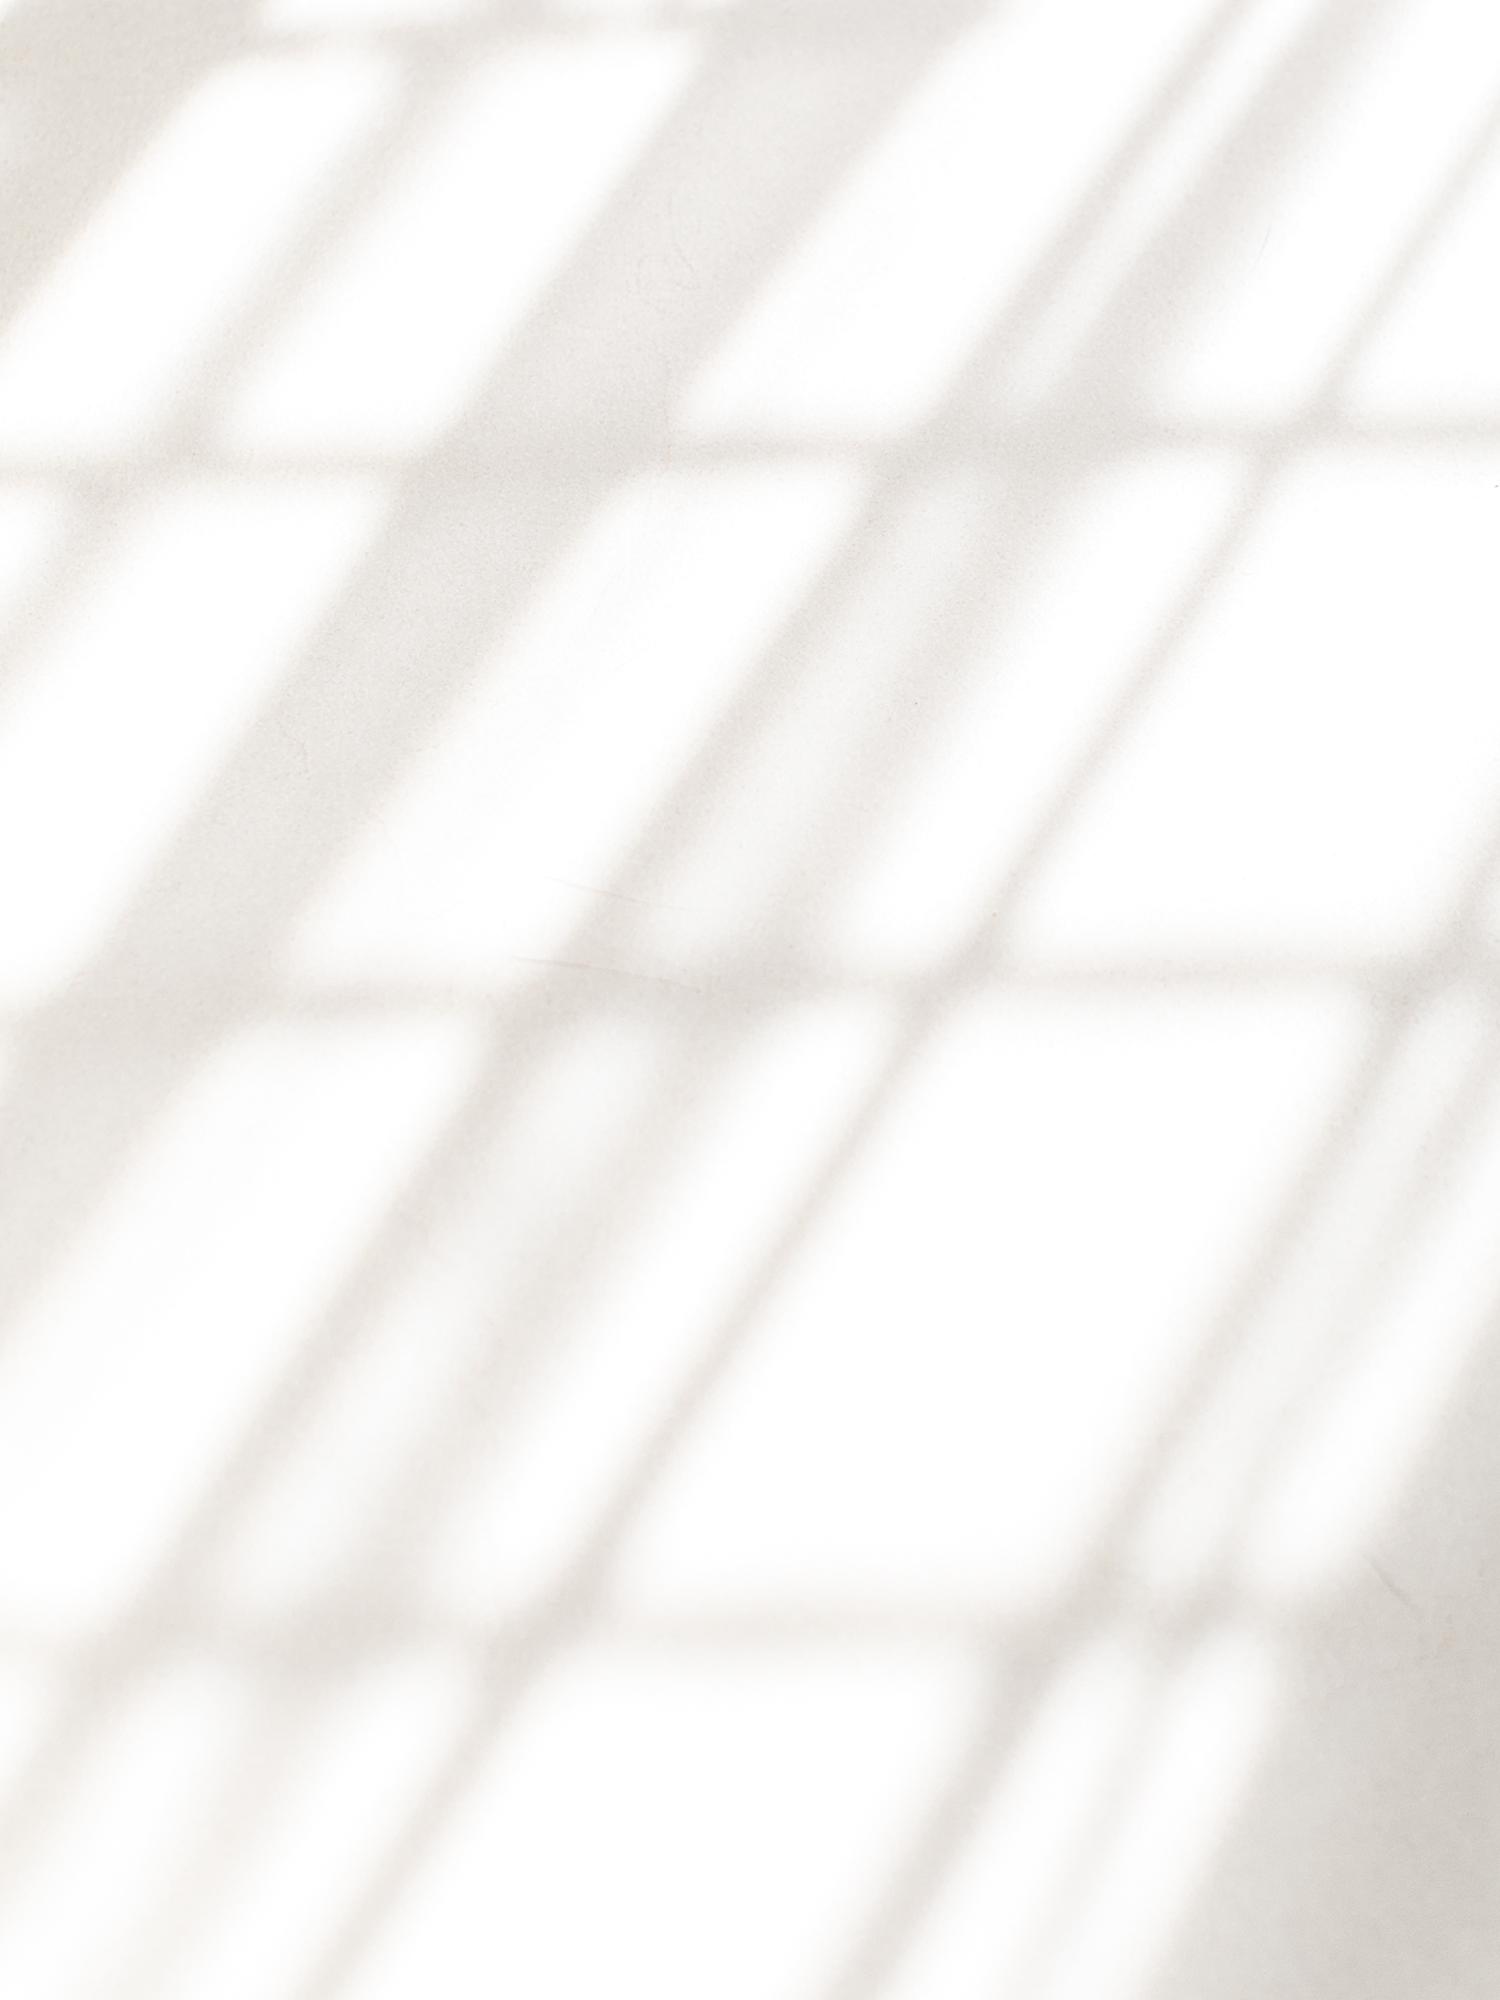 melissa+durrant+shadow